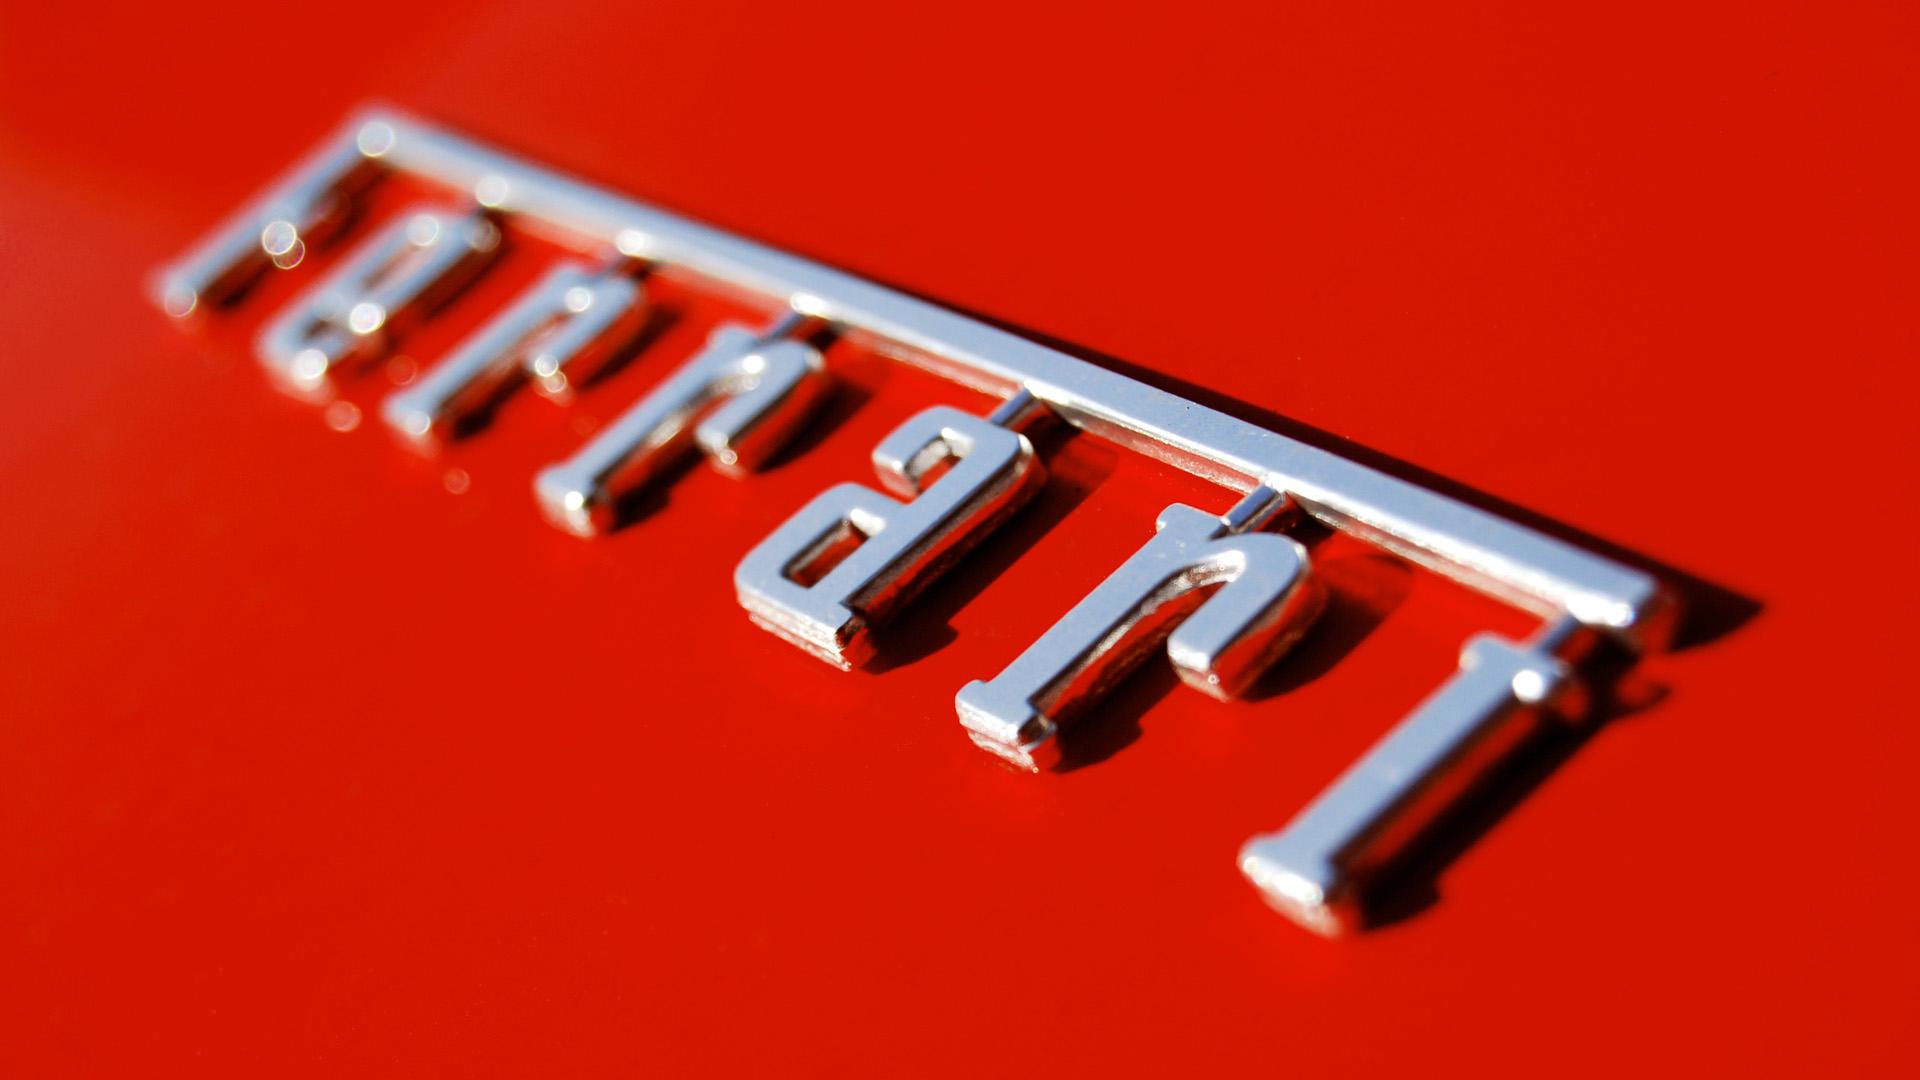 Hd Wallpaper For Windows 7 1080p 10 Hd Ferrari Logo Wallpapers